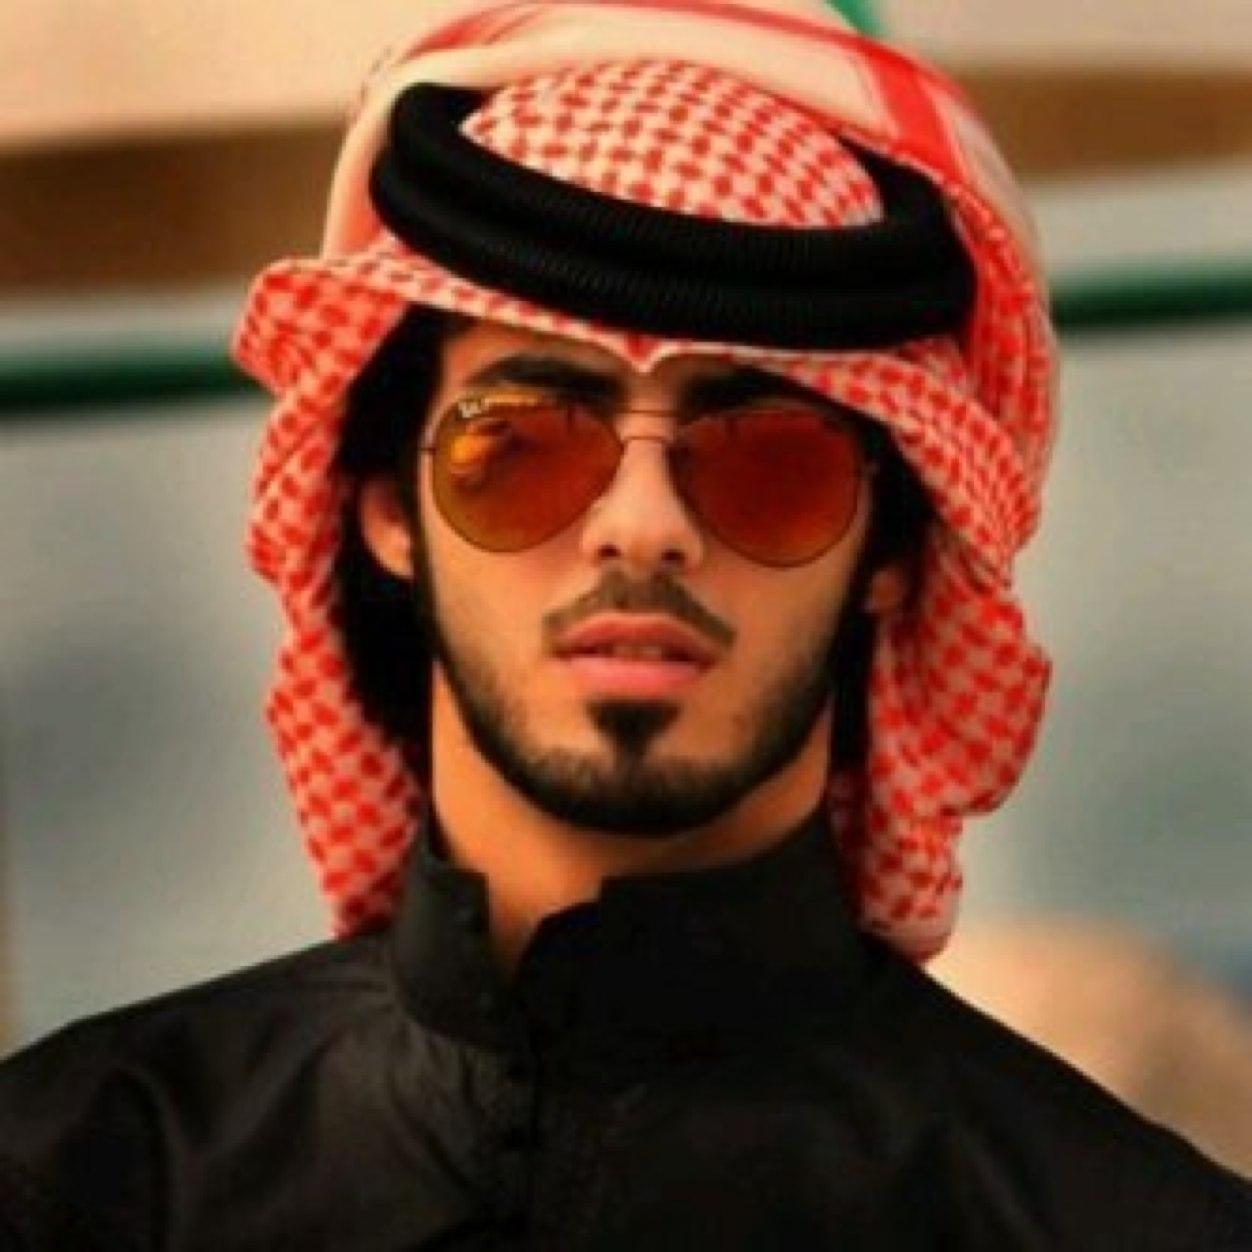 صورة صور شباب سعوديين , تعرف على شباب السعوديه بالصور